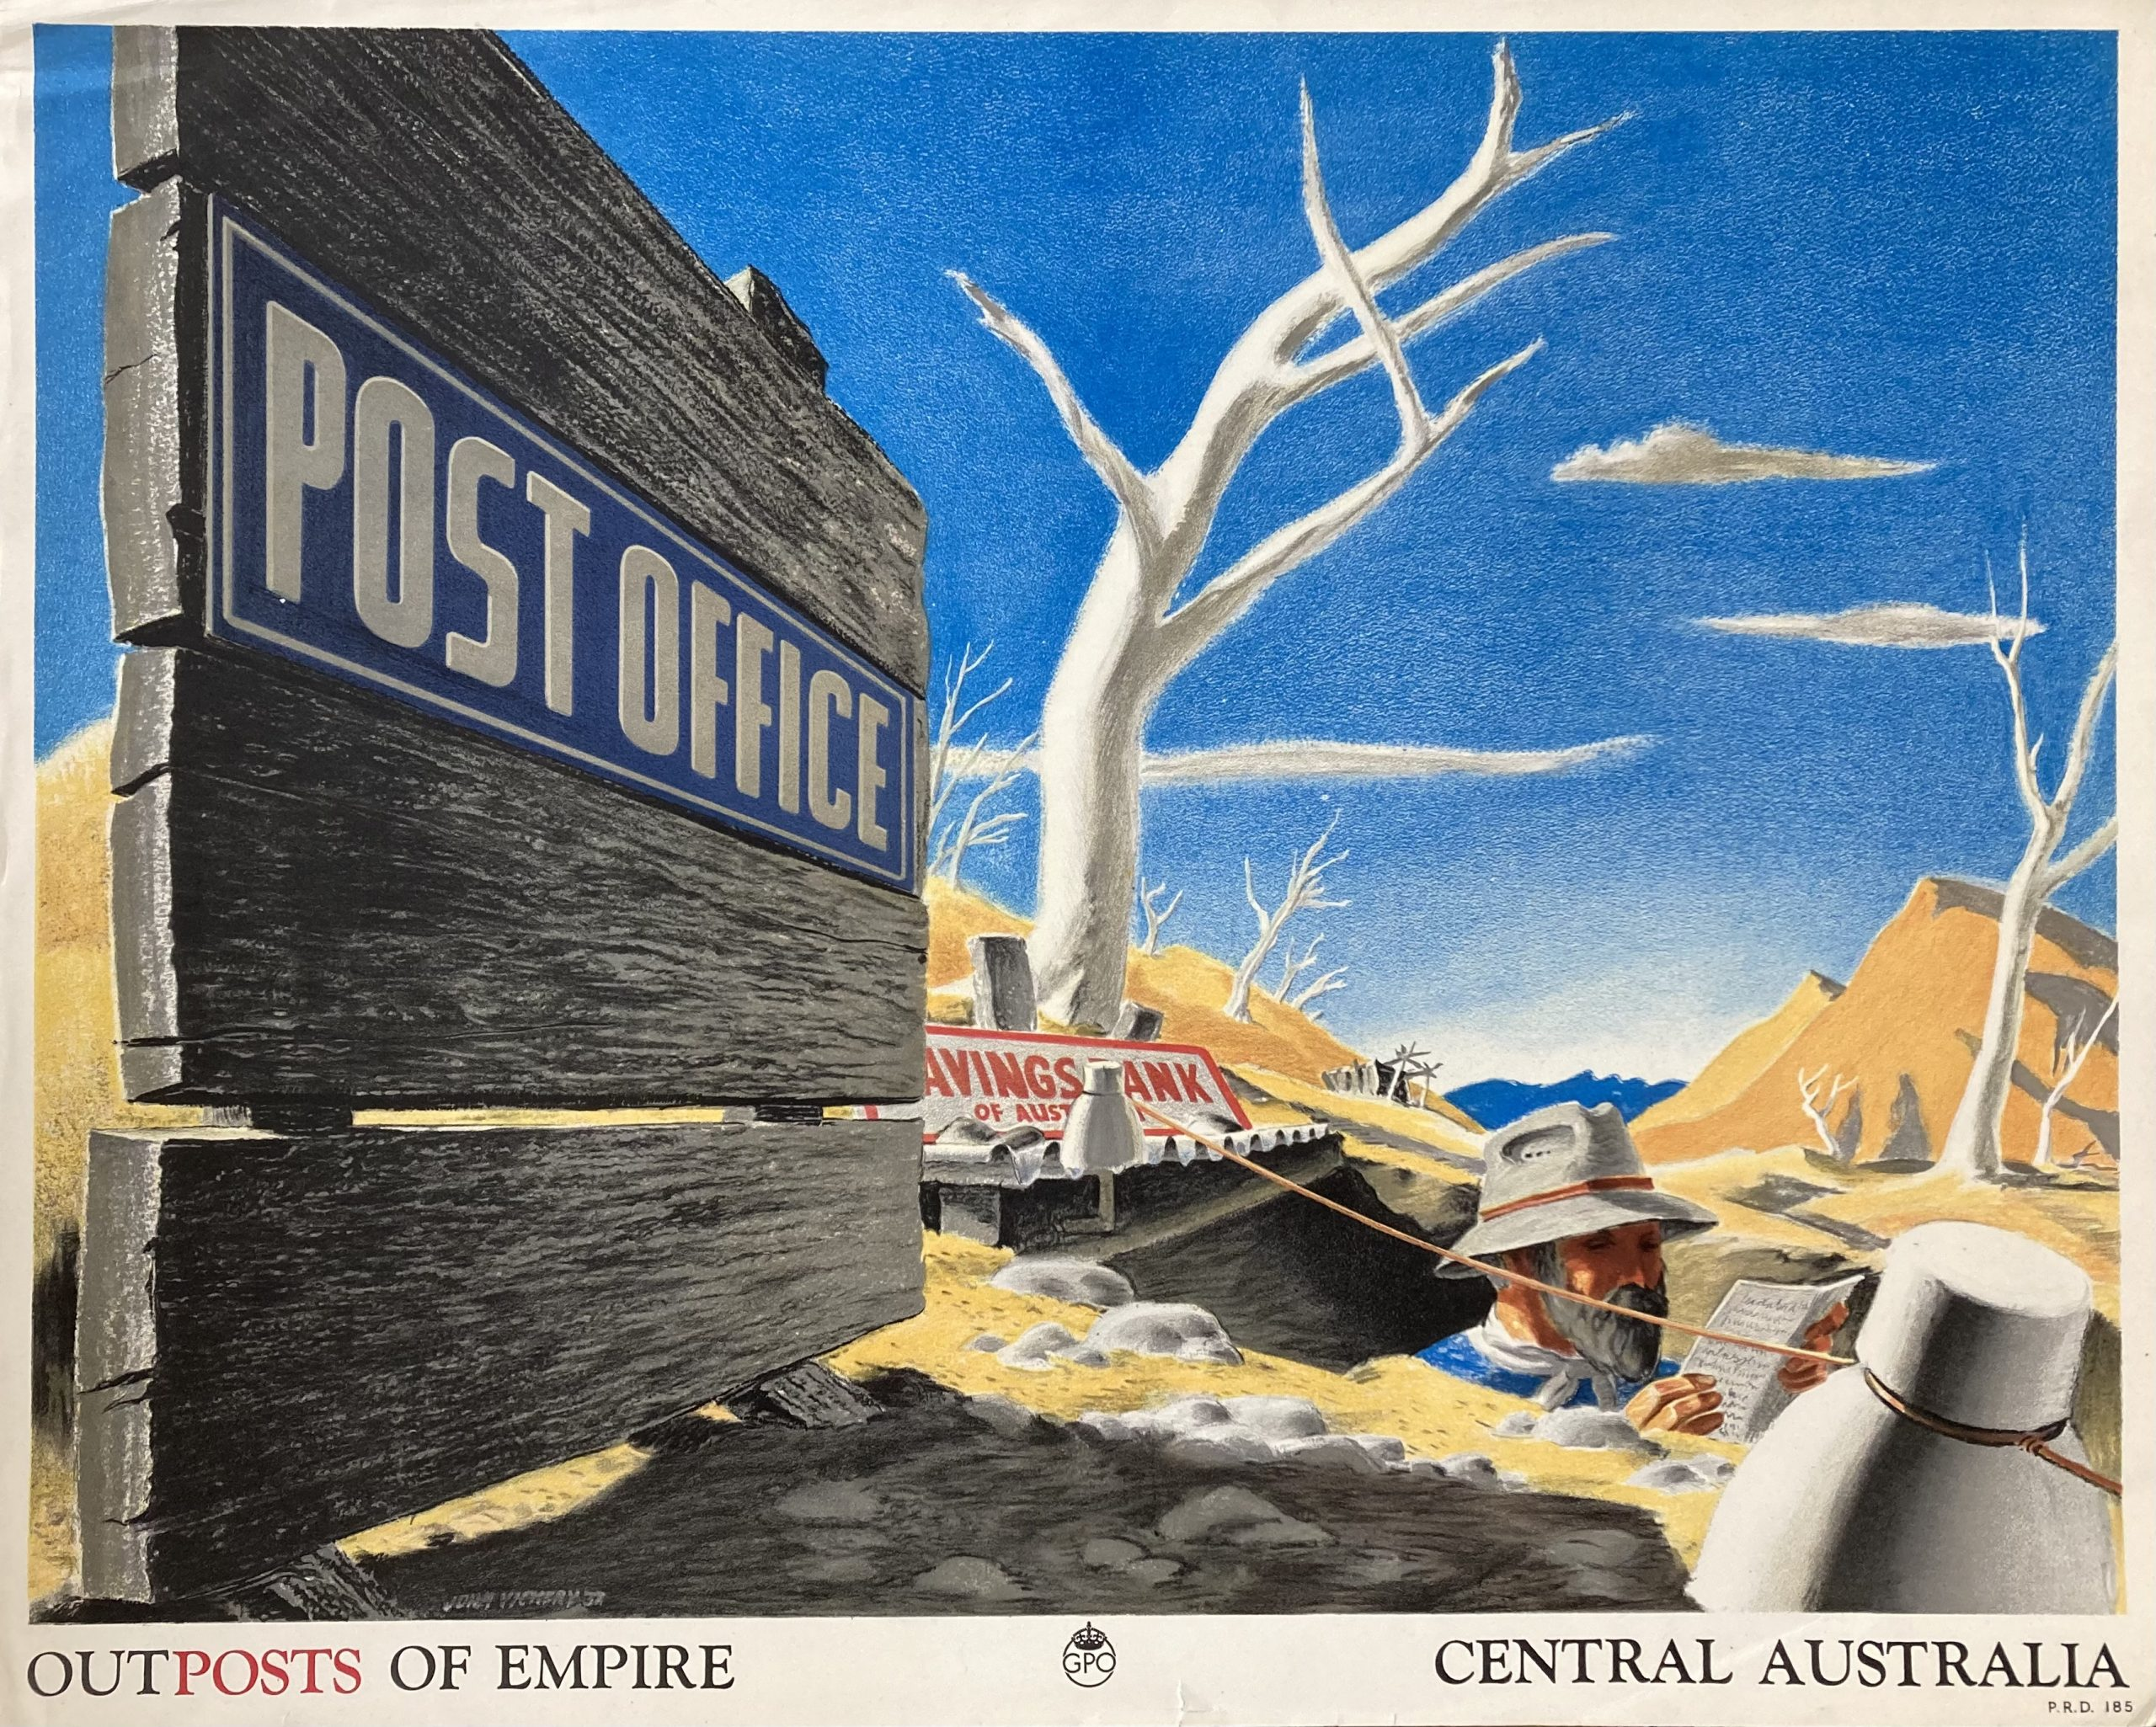 Central Australia poster